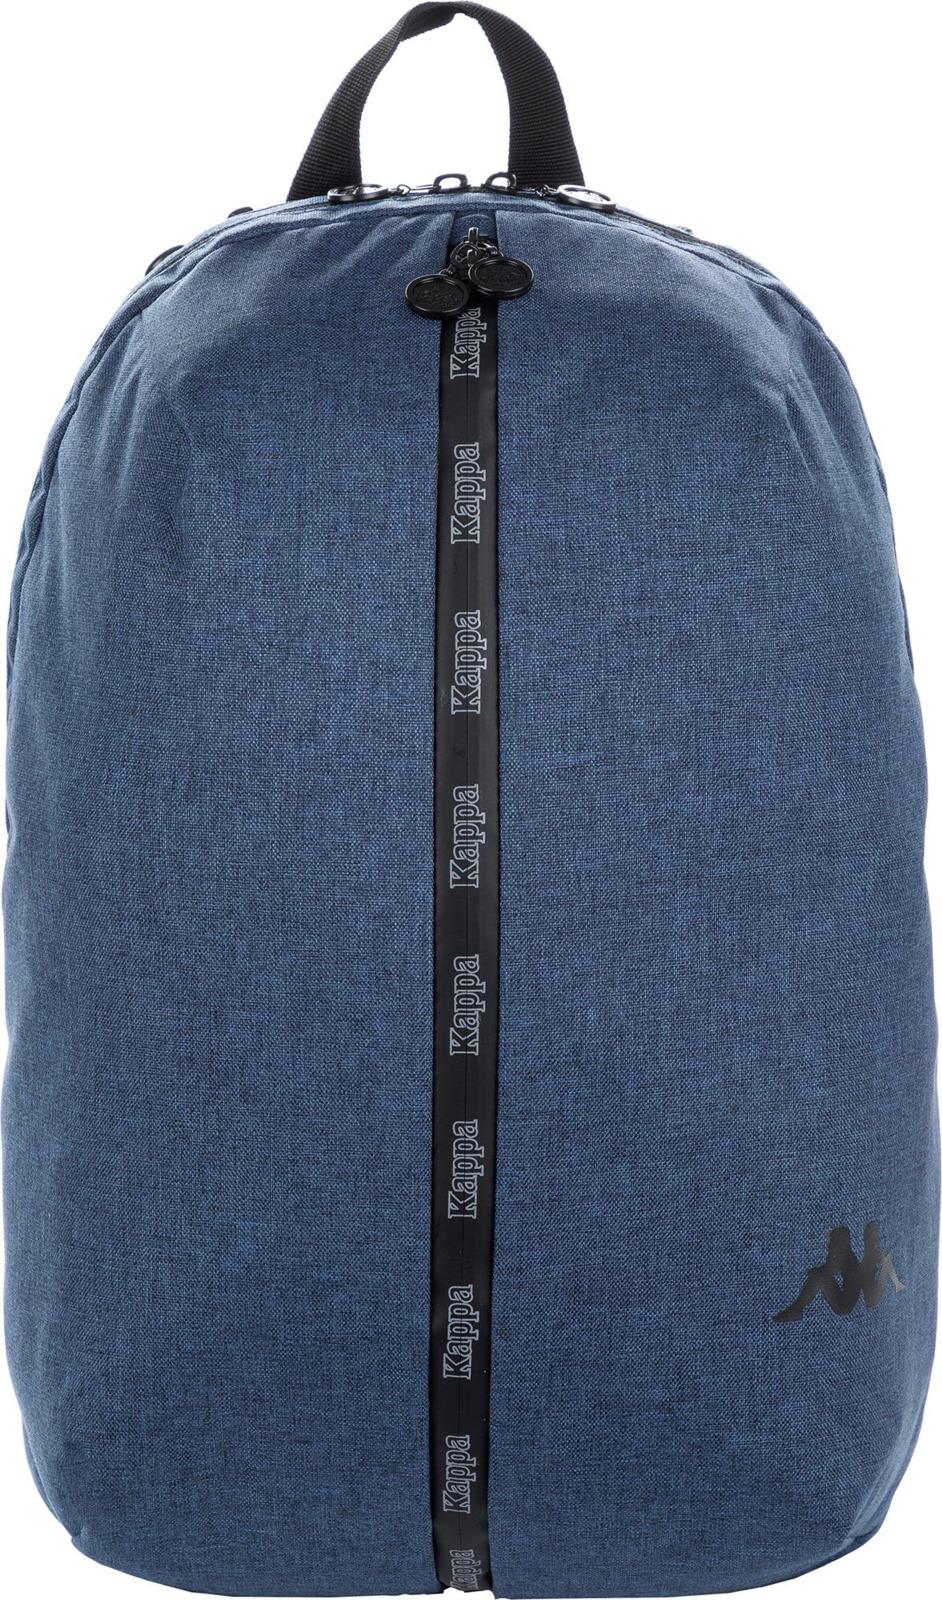 Рюкзак мужской Kappa Backpack, 304IGV0-5M, темно-синий рюкзак мужской quiksilver everydaypostemb m eqybp03501 bng0 королевский синий